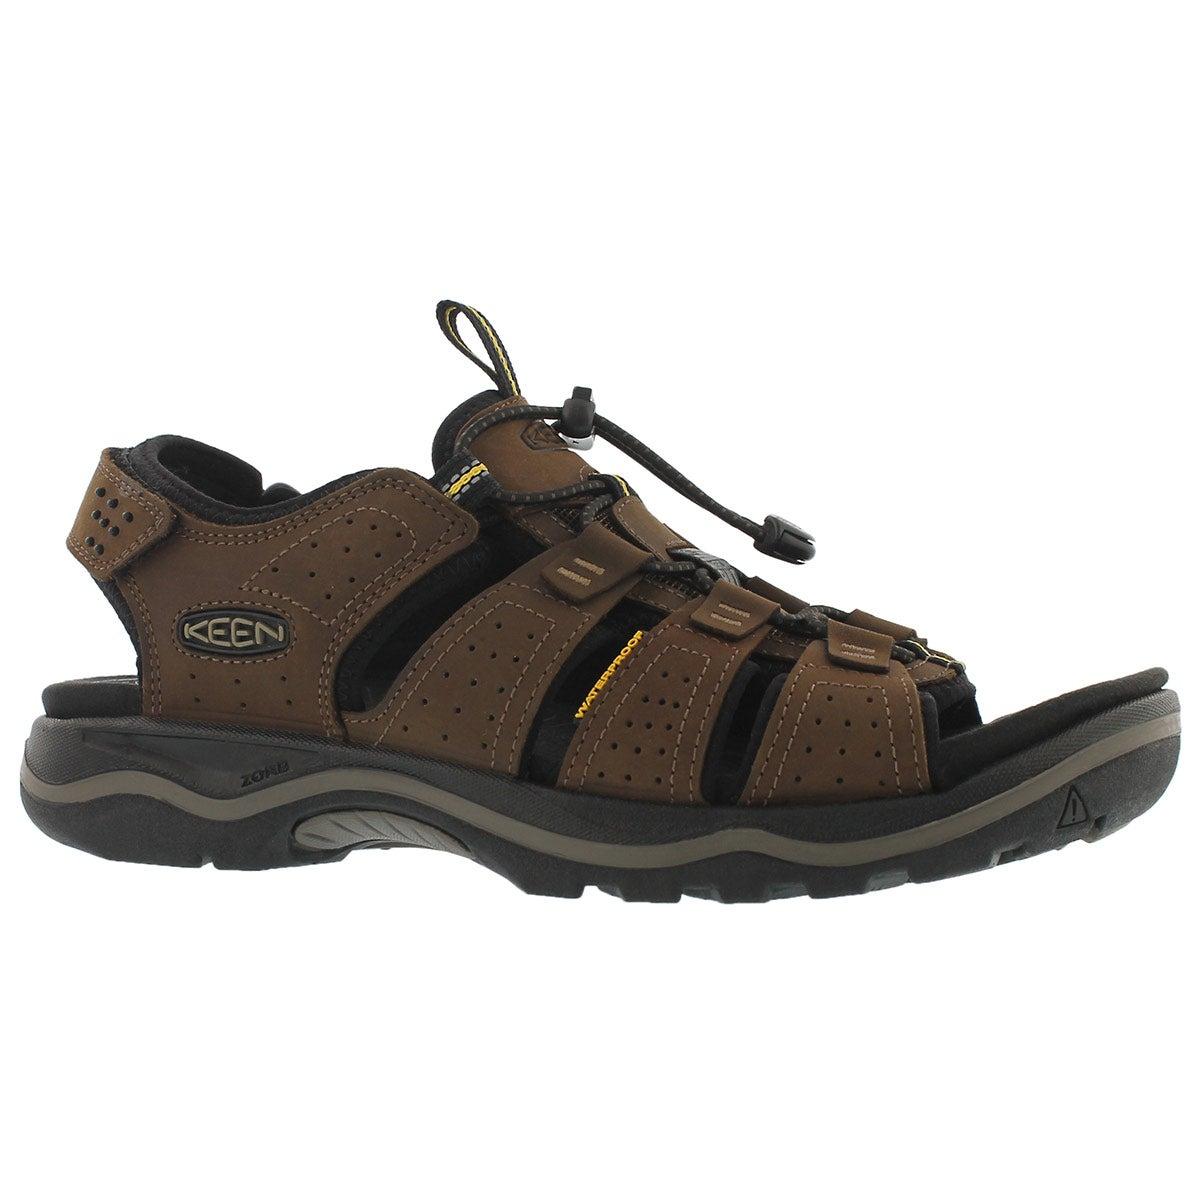 Men's RIALTO OPEN TOE dark earth sport sandals